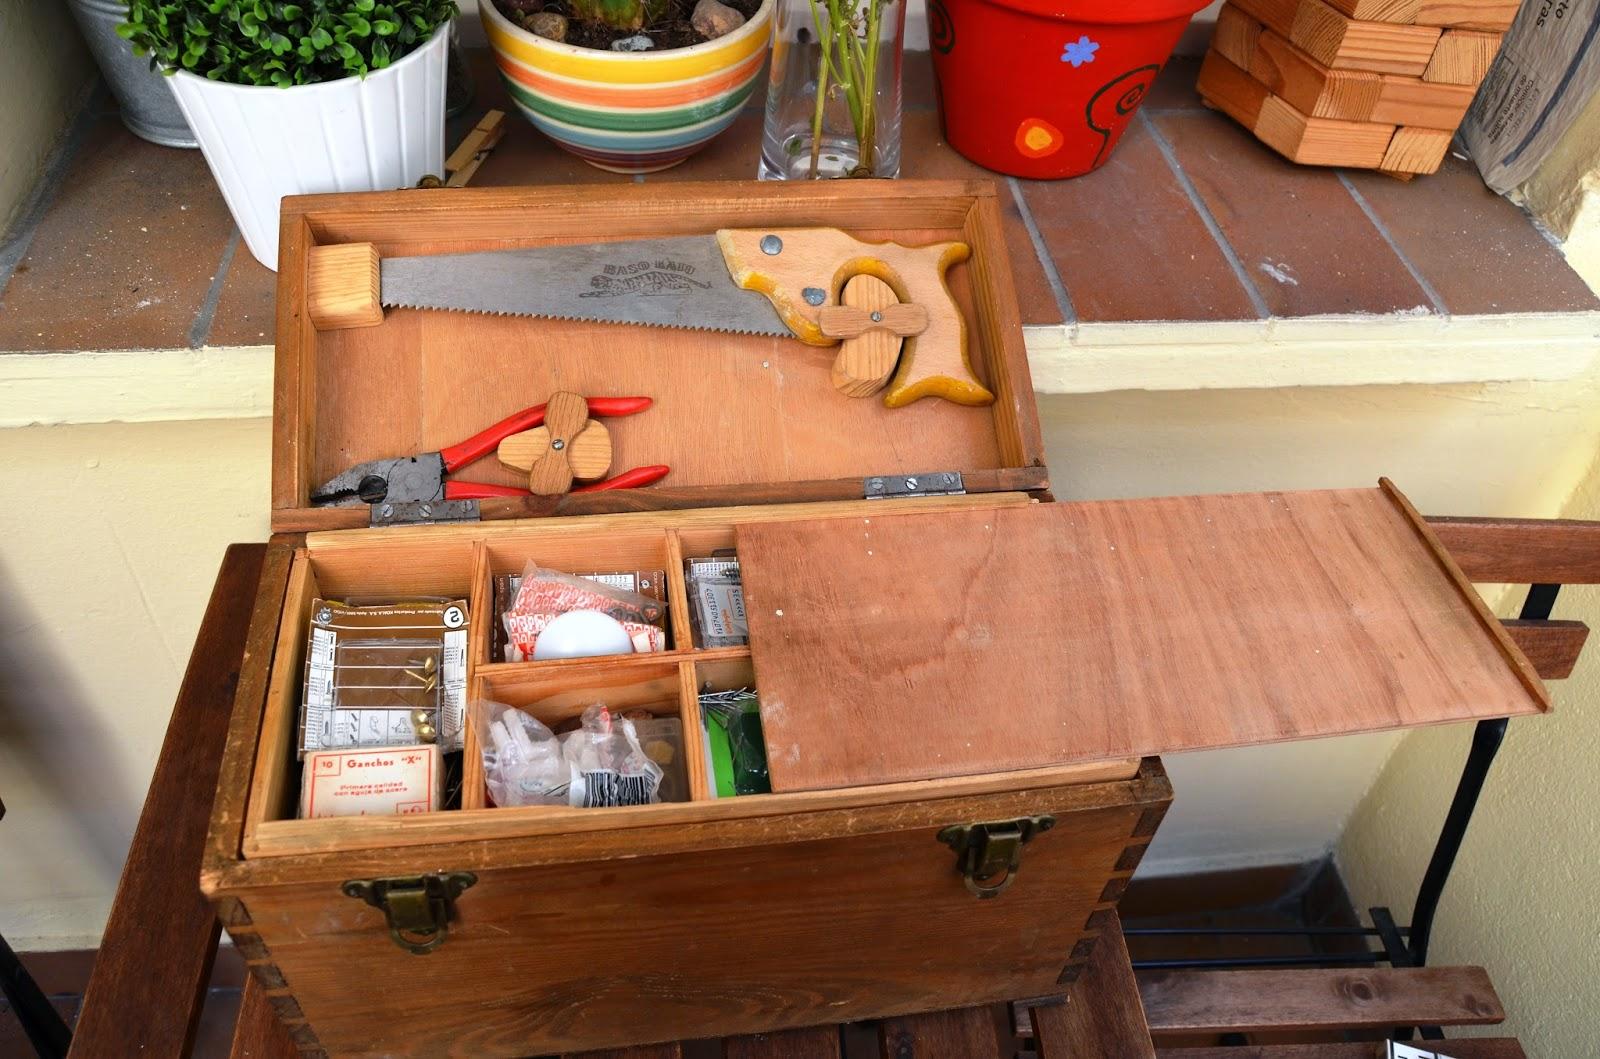 Naifandtastic decoraci n craft hecho a mano for Cajas de madera ikea